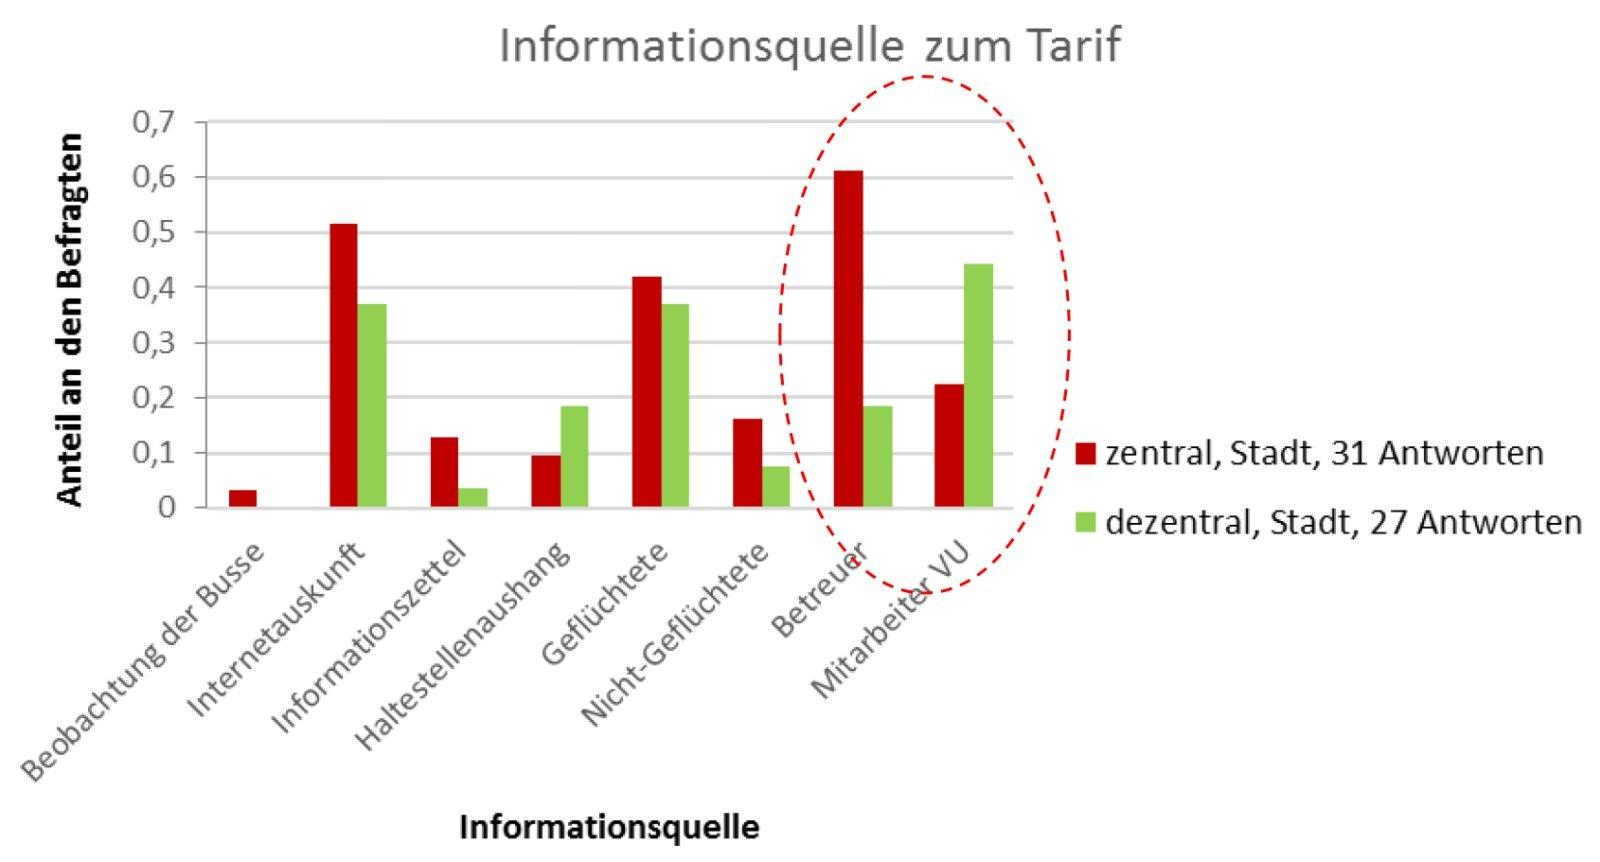 Informationsquellen zum Tarif